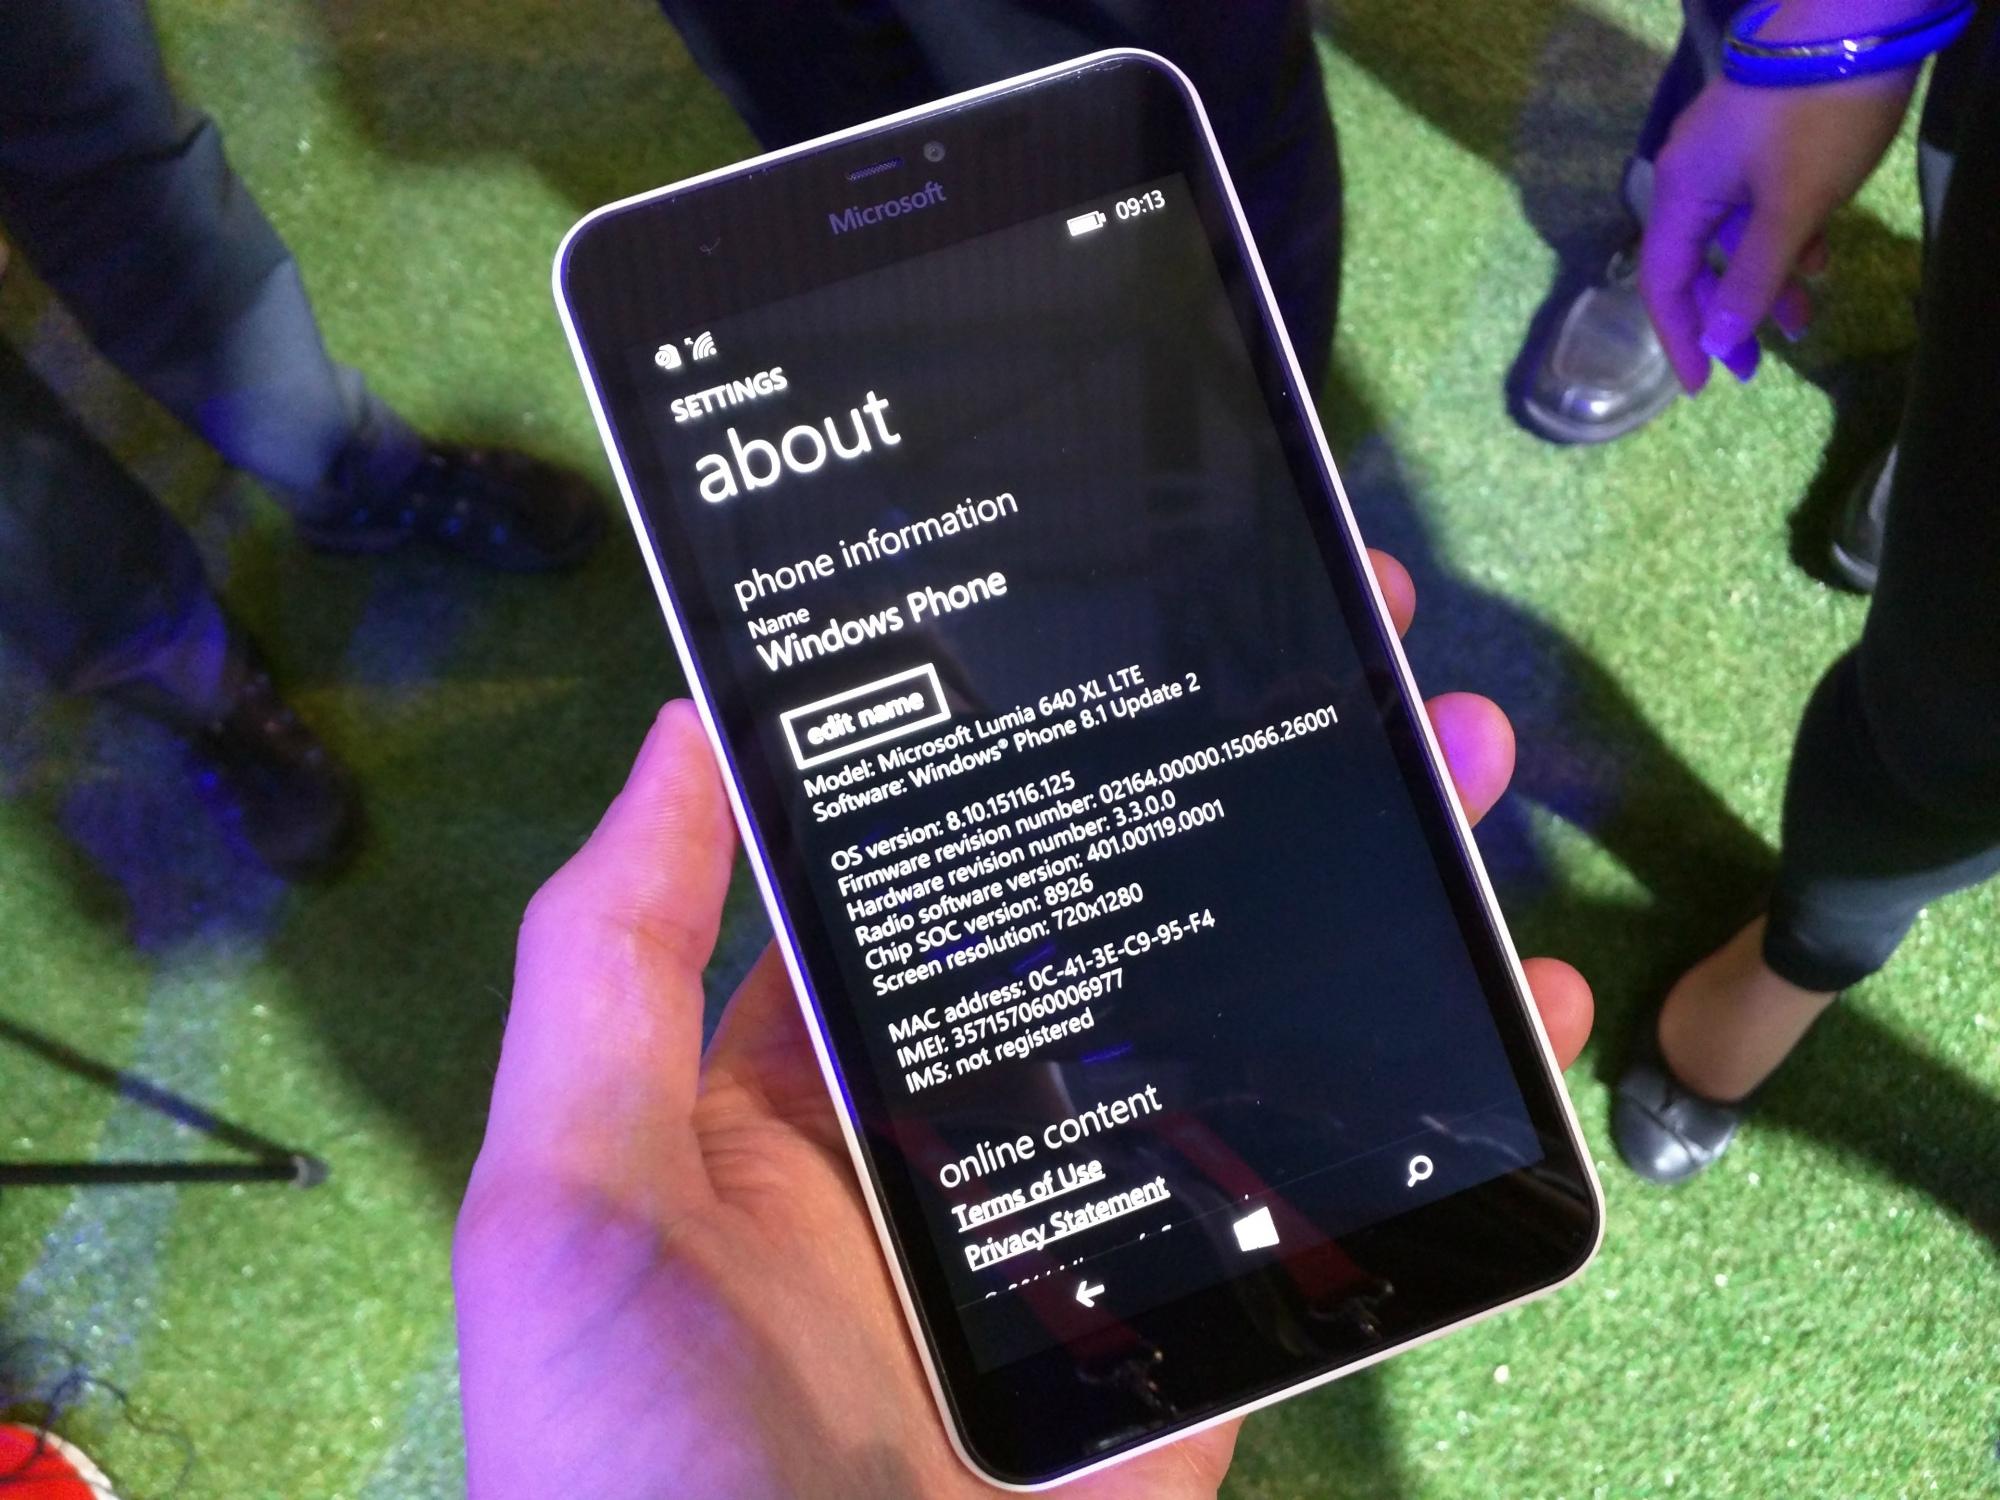 Windows Phone 8.1 Update 2 con Lumia Denim incluye el Lumia 640 XL